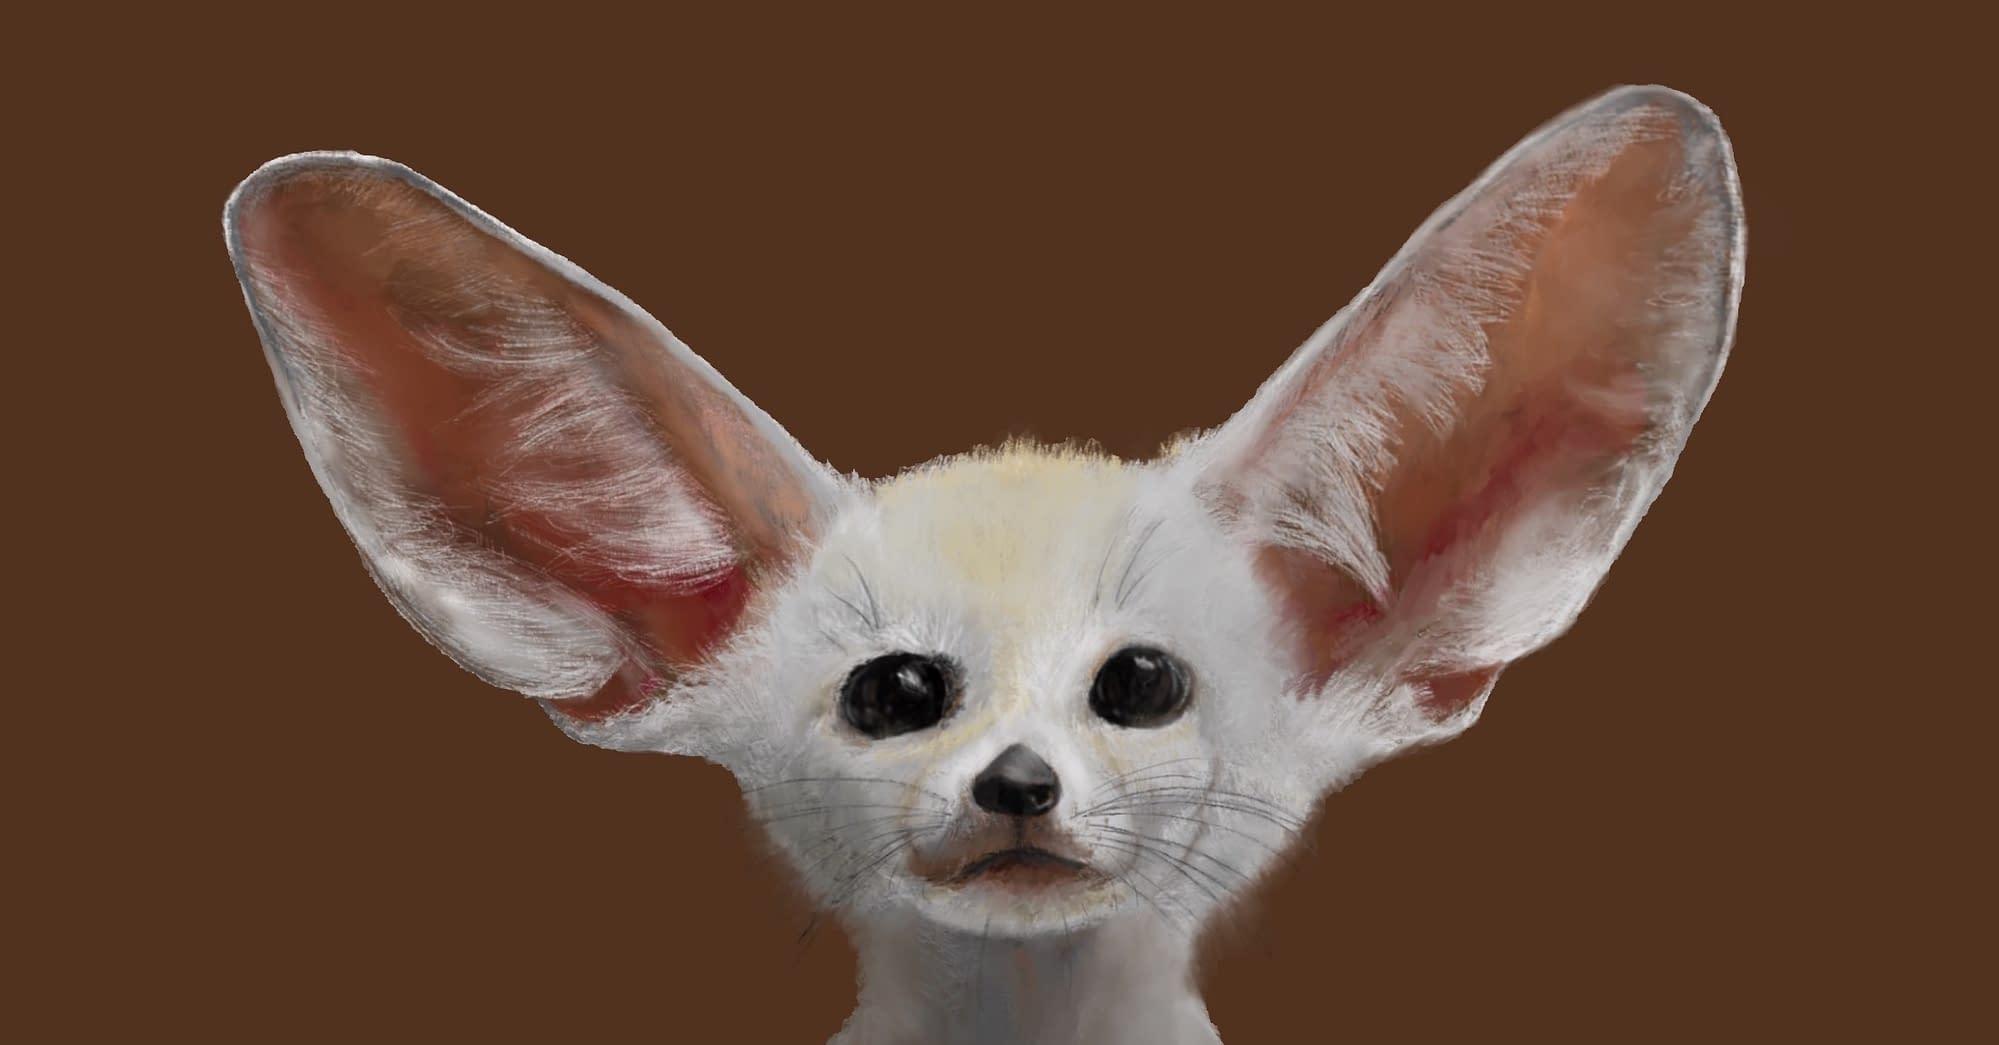 Fennec fox - Artwork - Untraced digital portrait of a fennec fox drawn from scratch in Procreate on iPad Pro. Part of a series I'm planning of digitally-drawn exotic/beautiful animal species'.